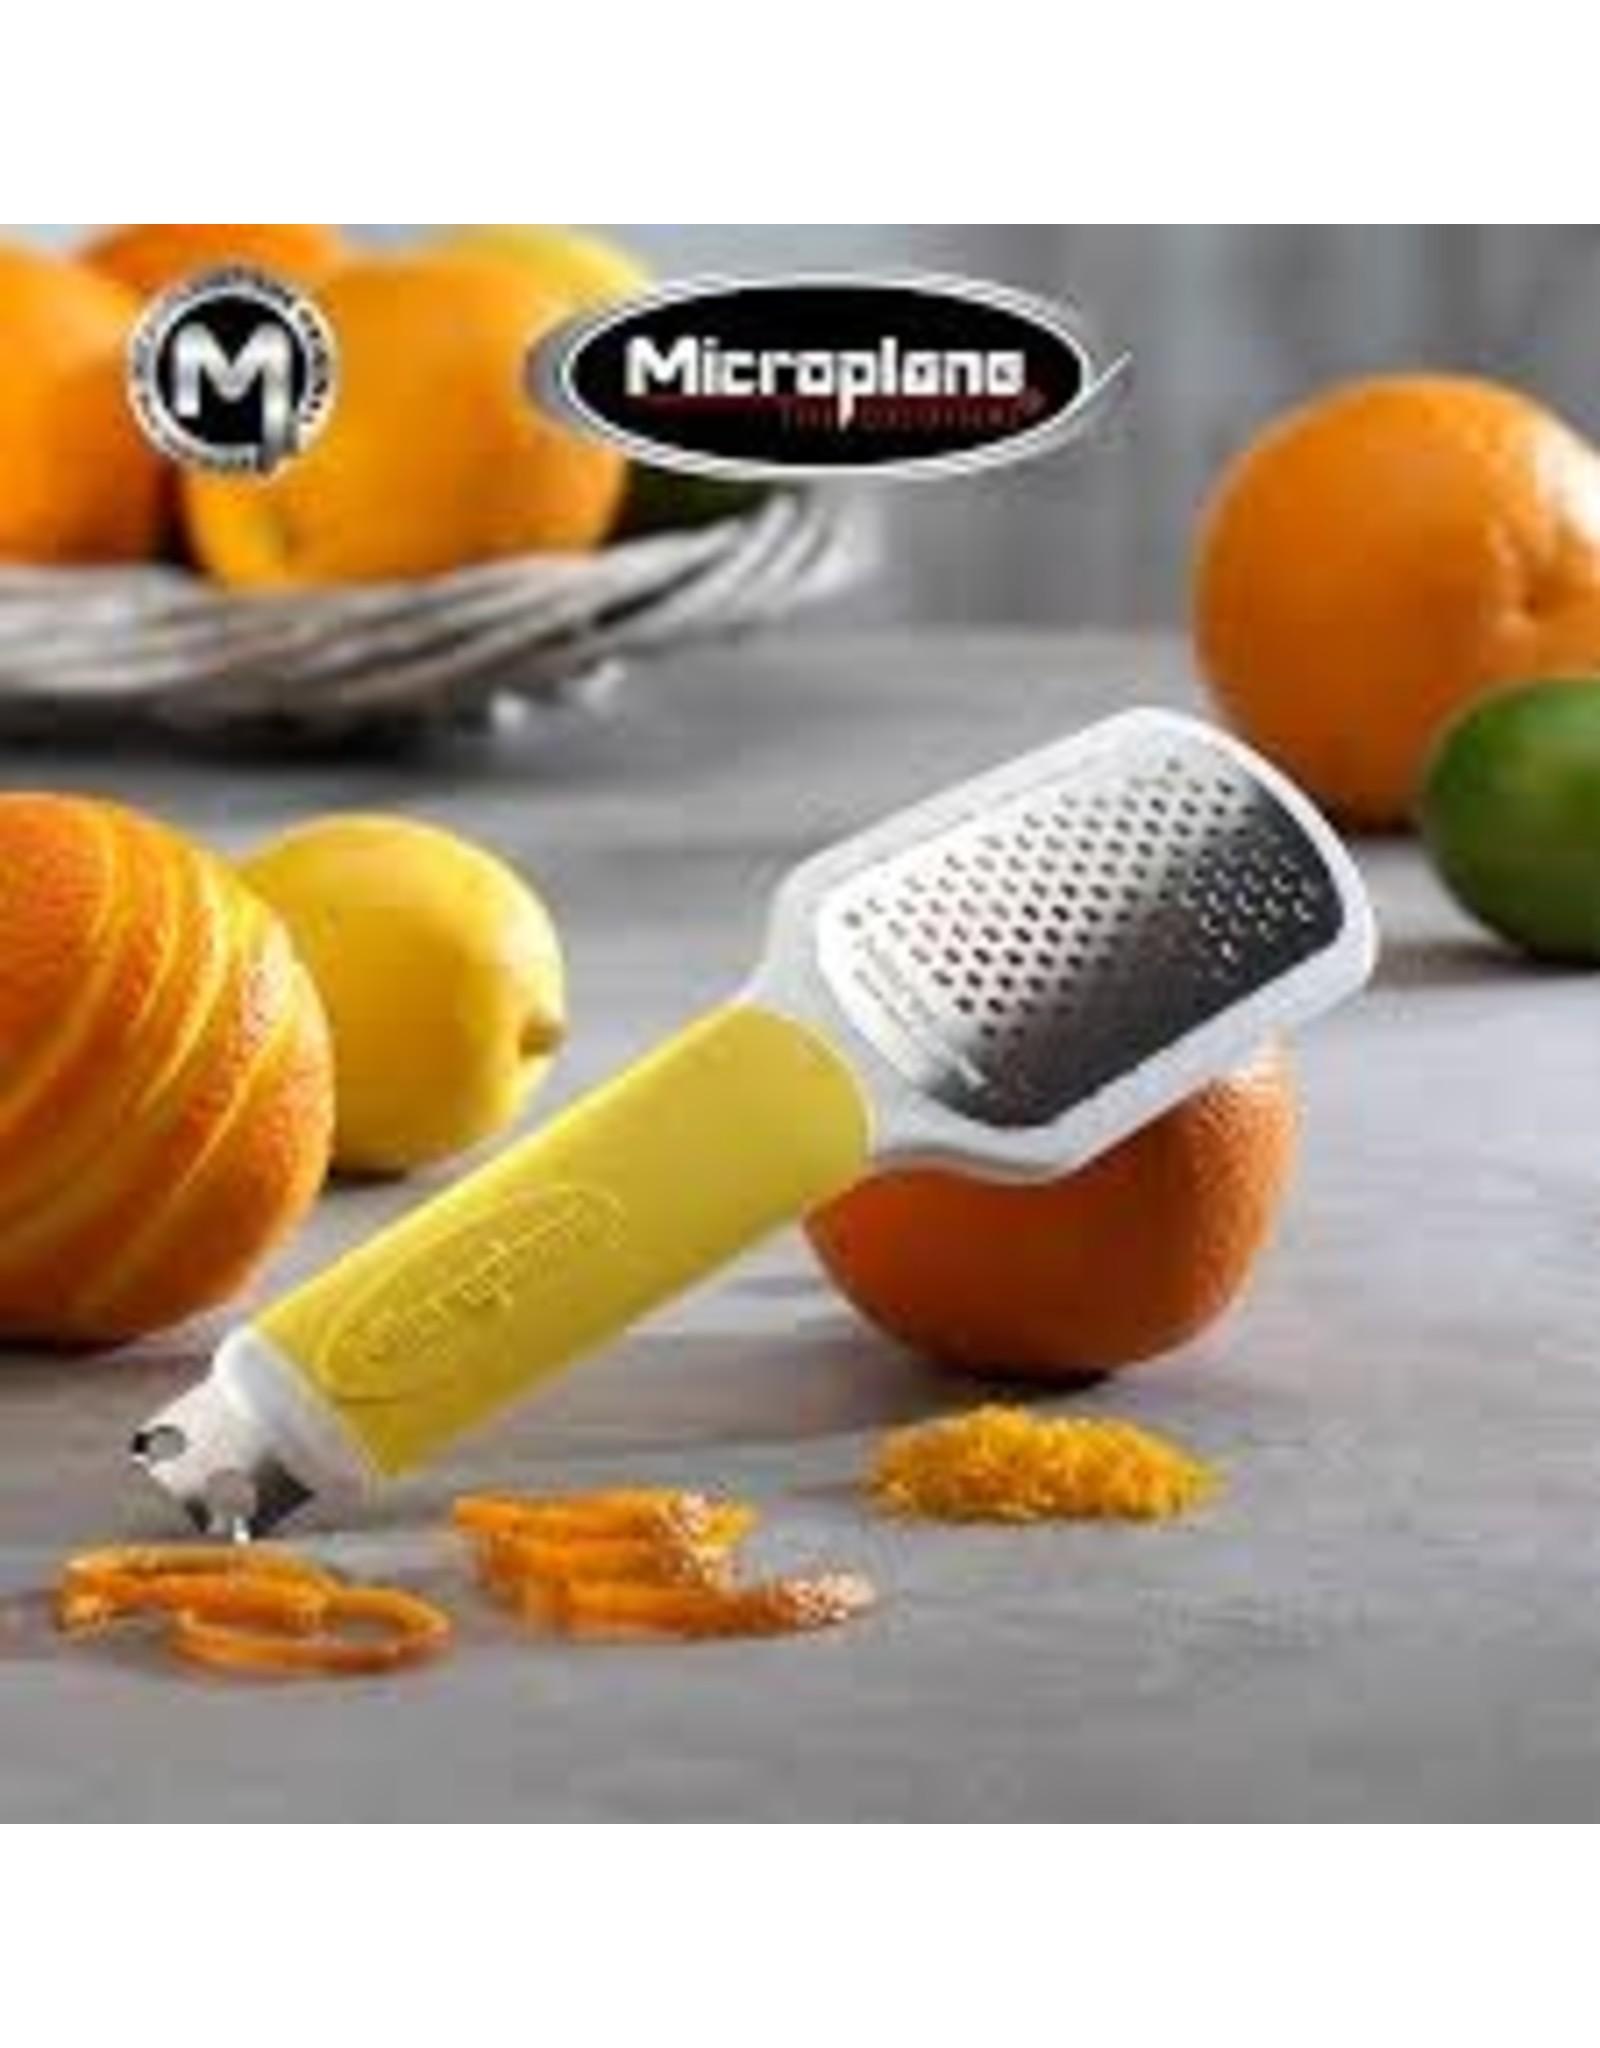 Microplane MICROPLANE Citrus Tool Yellow